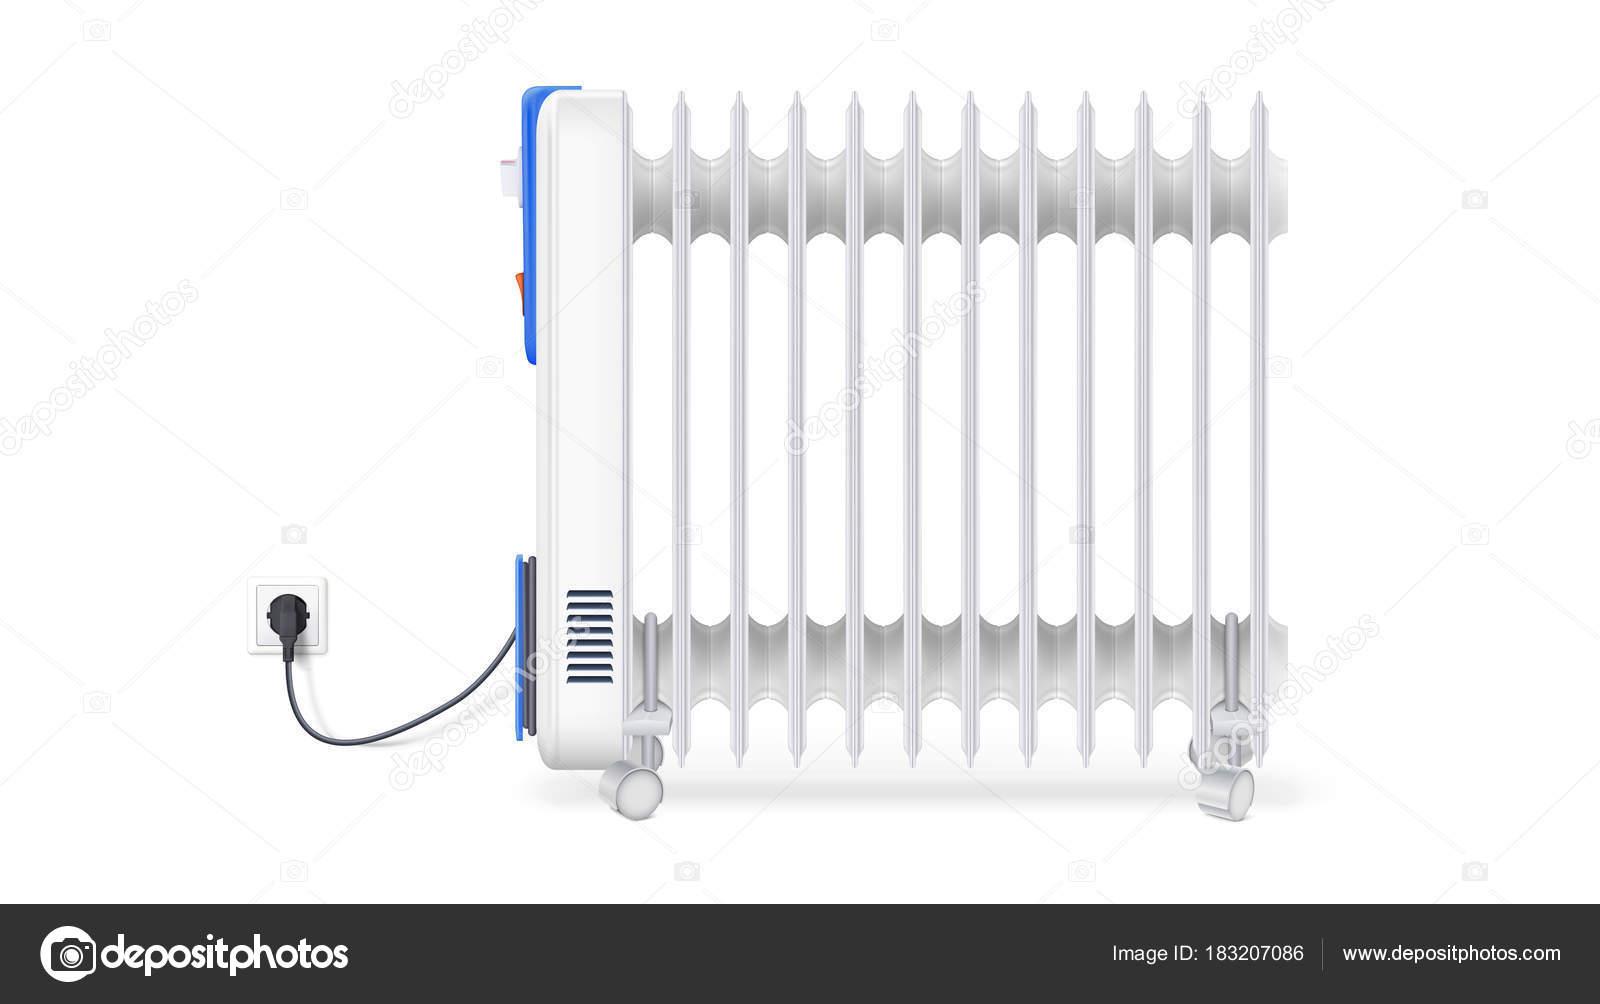 symbole radiateur lectrique affordable symbole radiateur lectrique with symbole radiateur. Black Bedroom Furniture Sets. Home Design Ideas